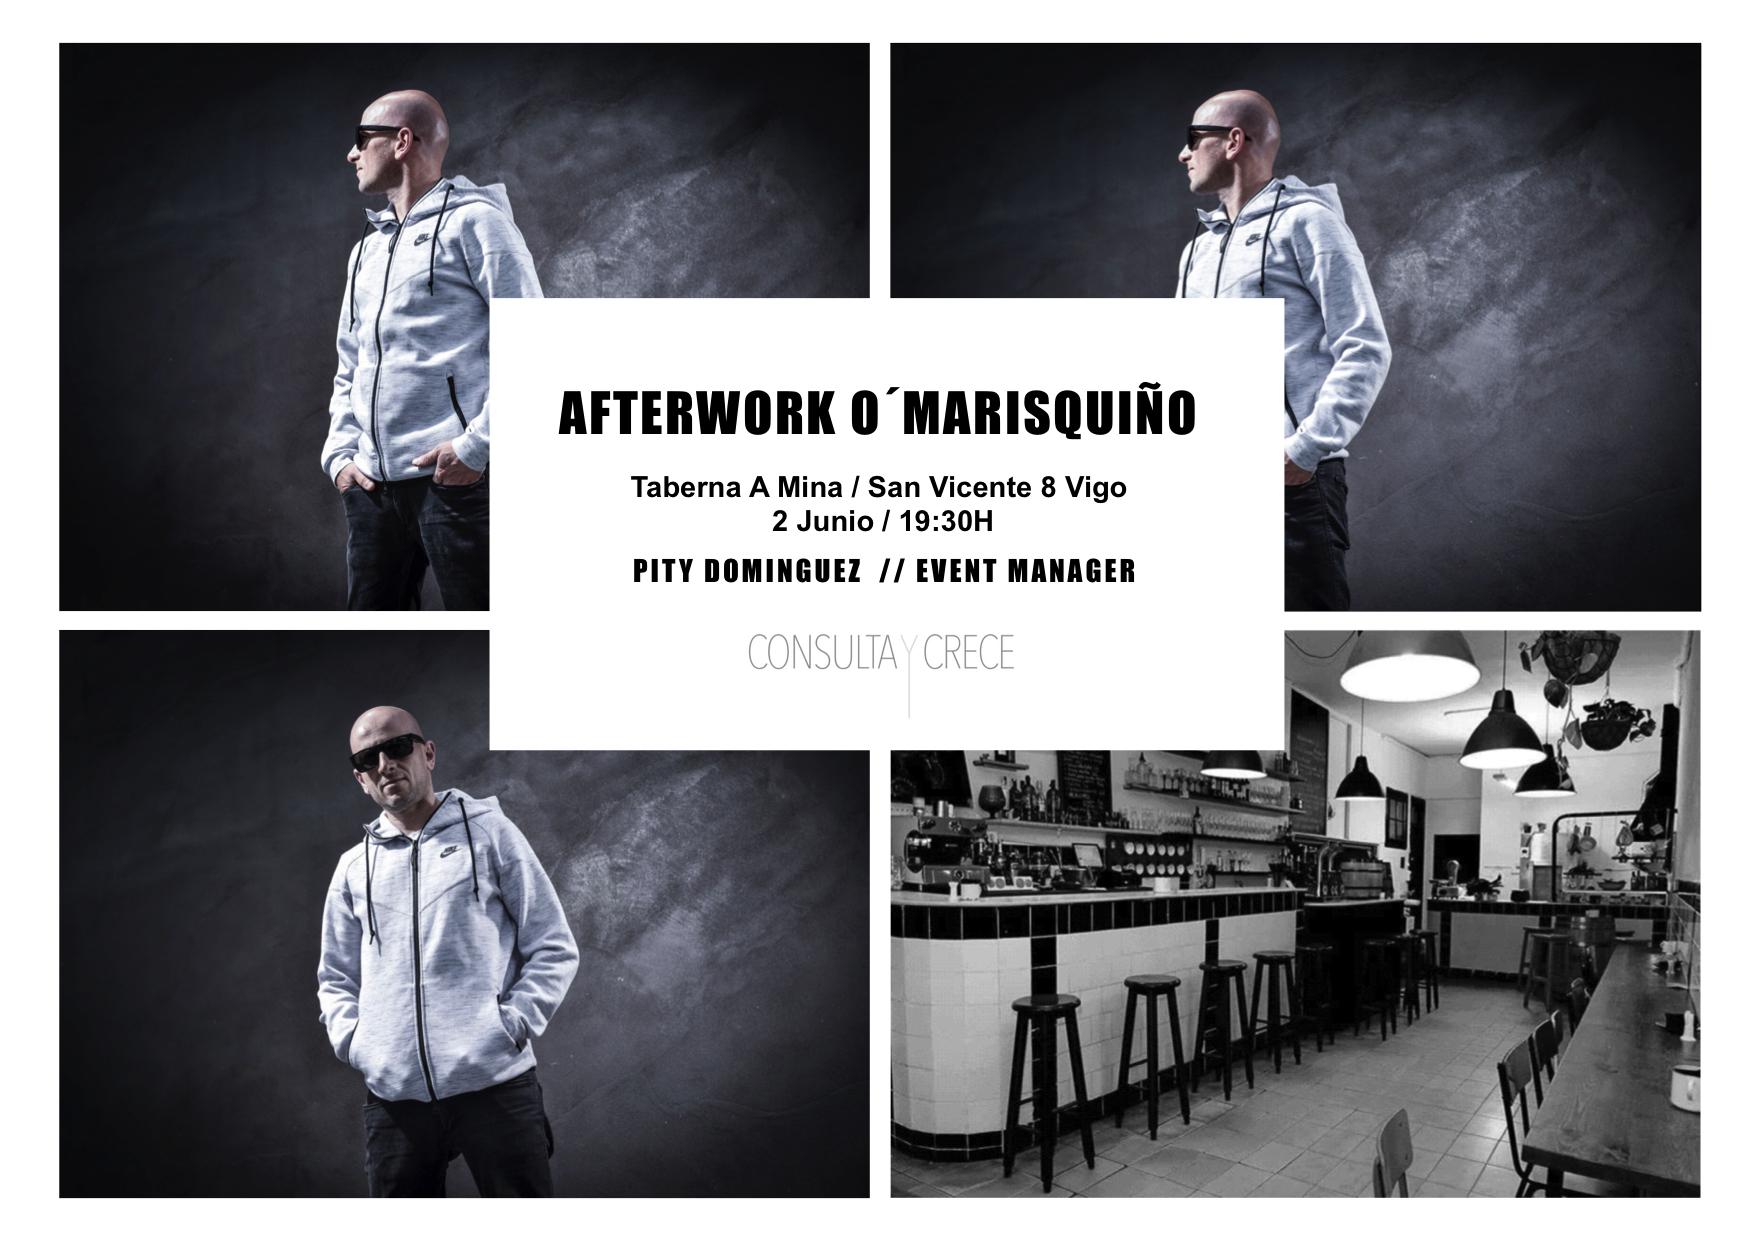 Afterwork o marisquiño consultaycrece networking